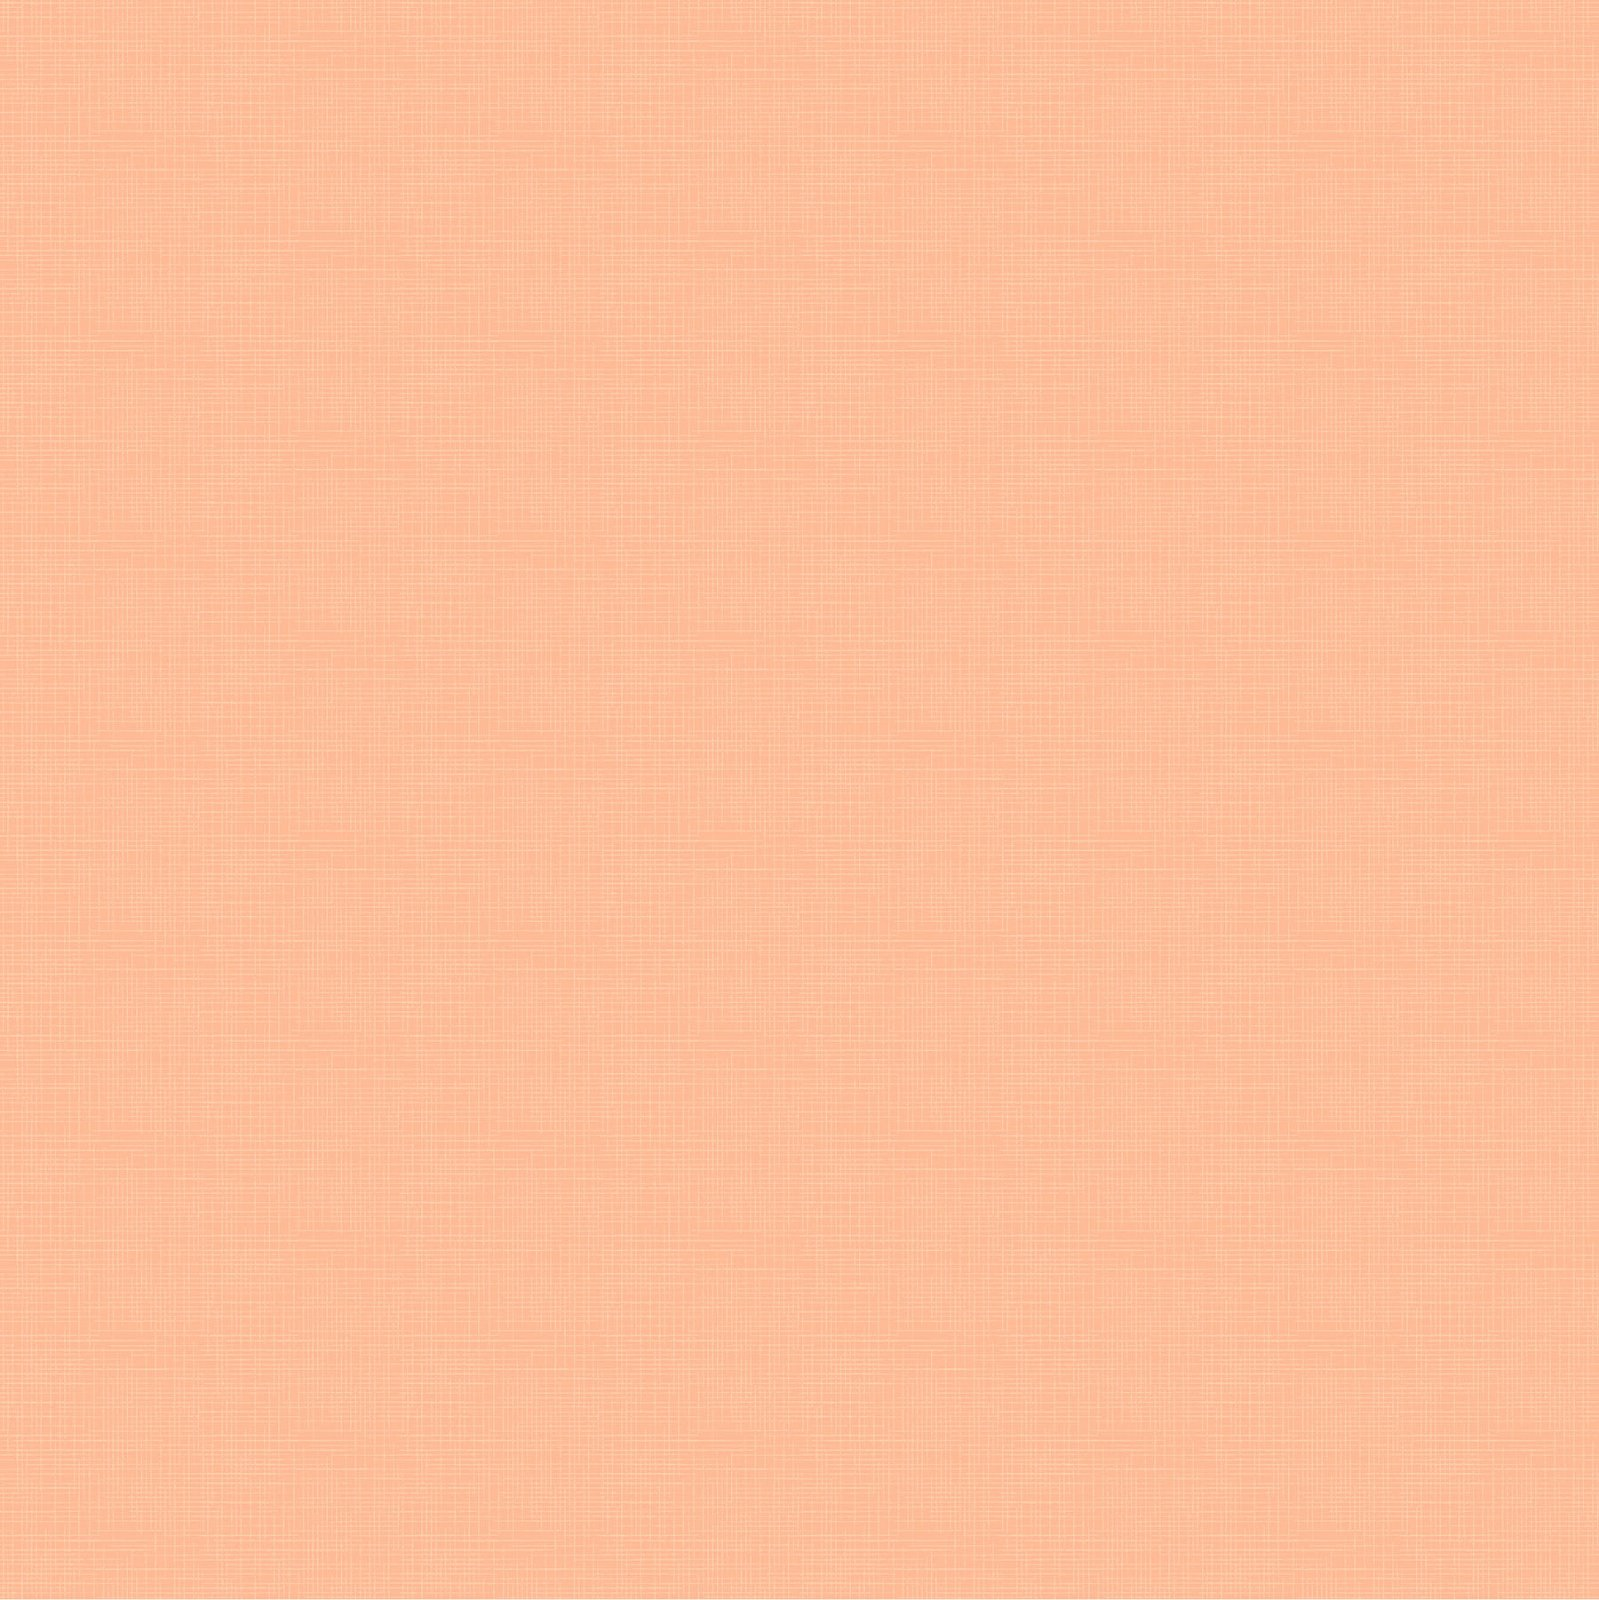 Dublin Peach Parfait 9040-54